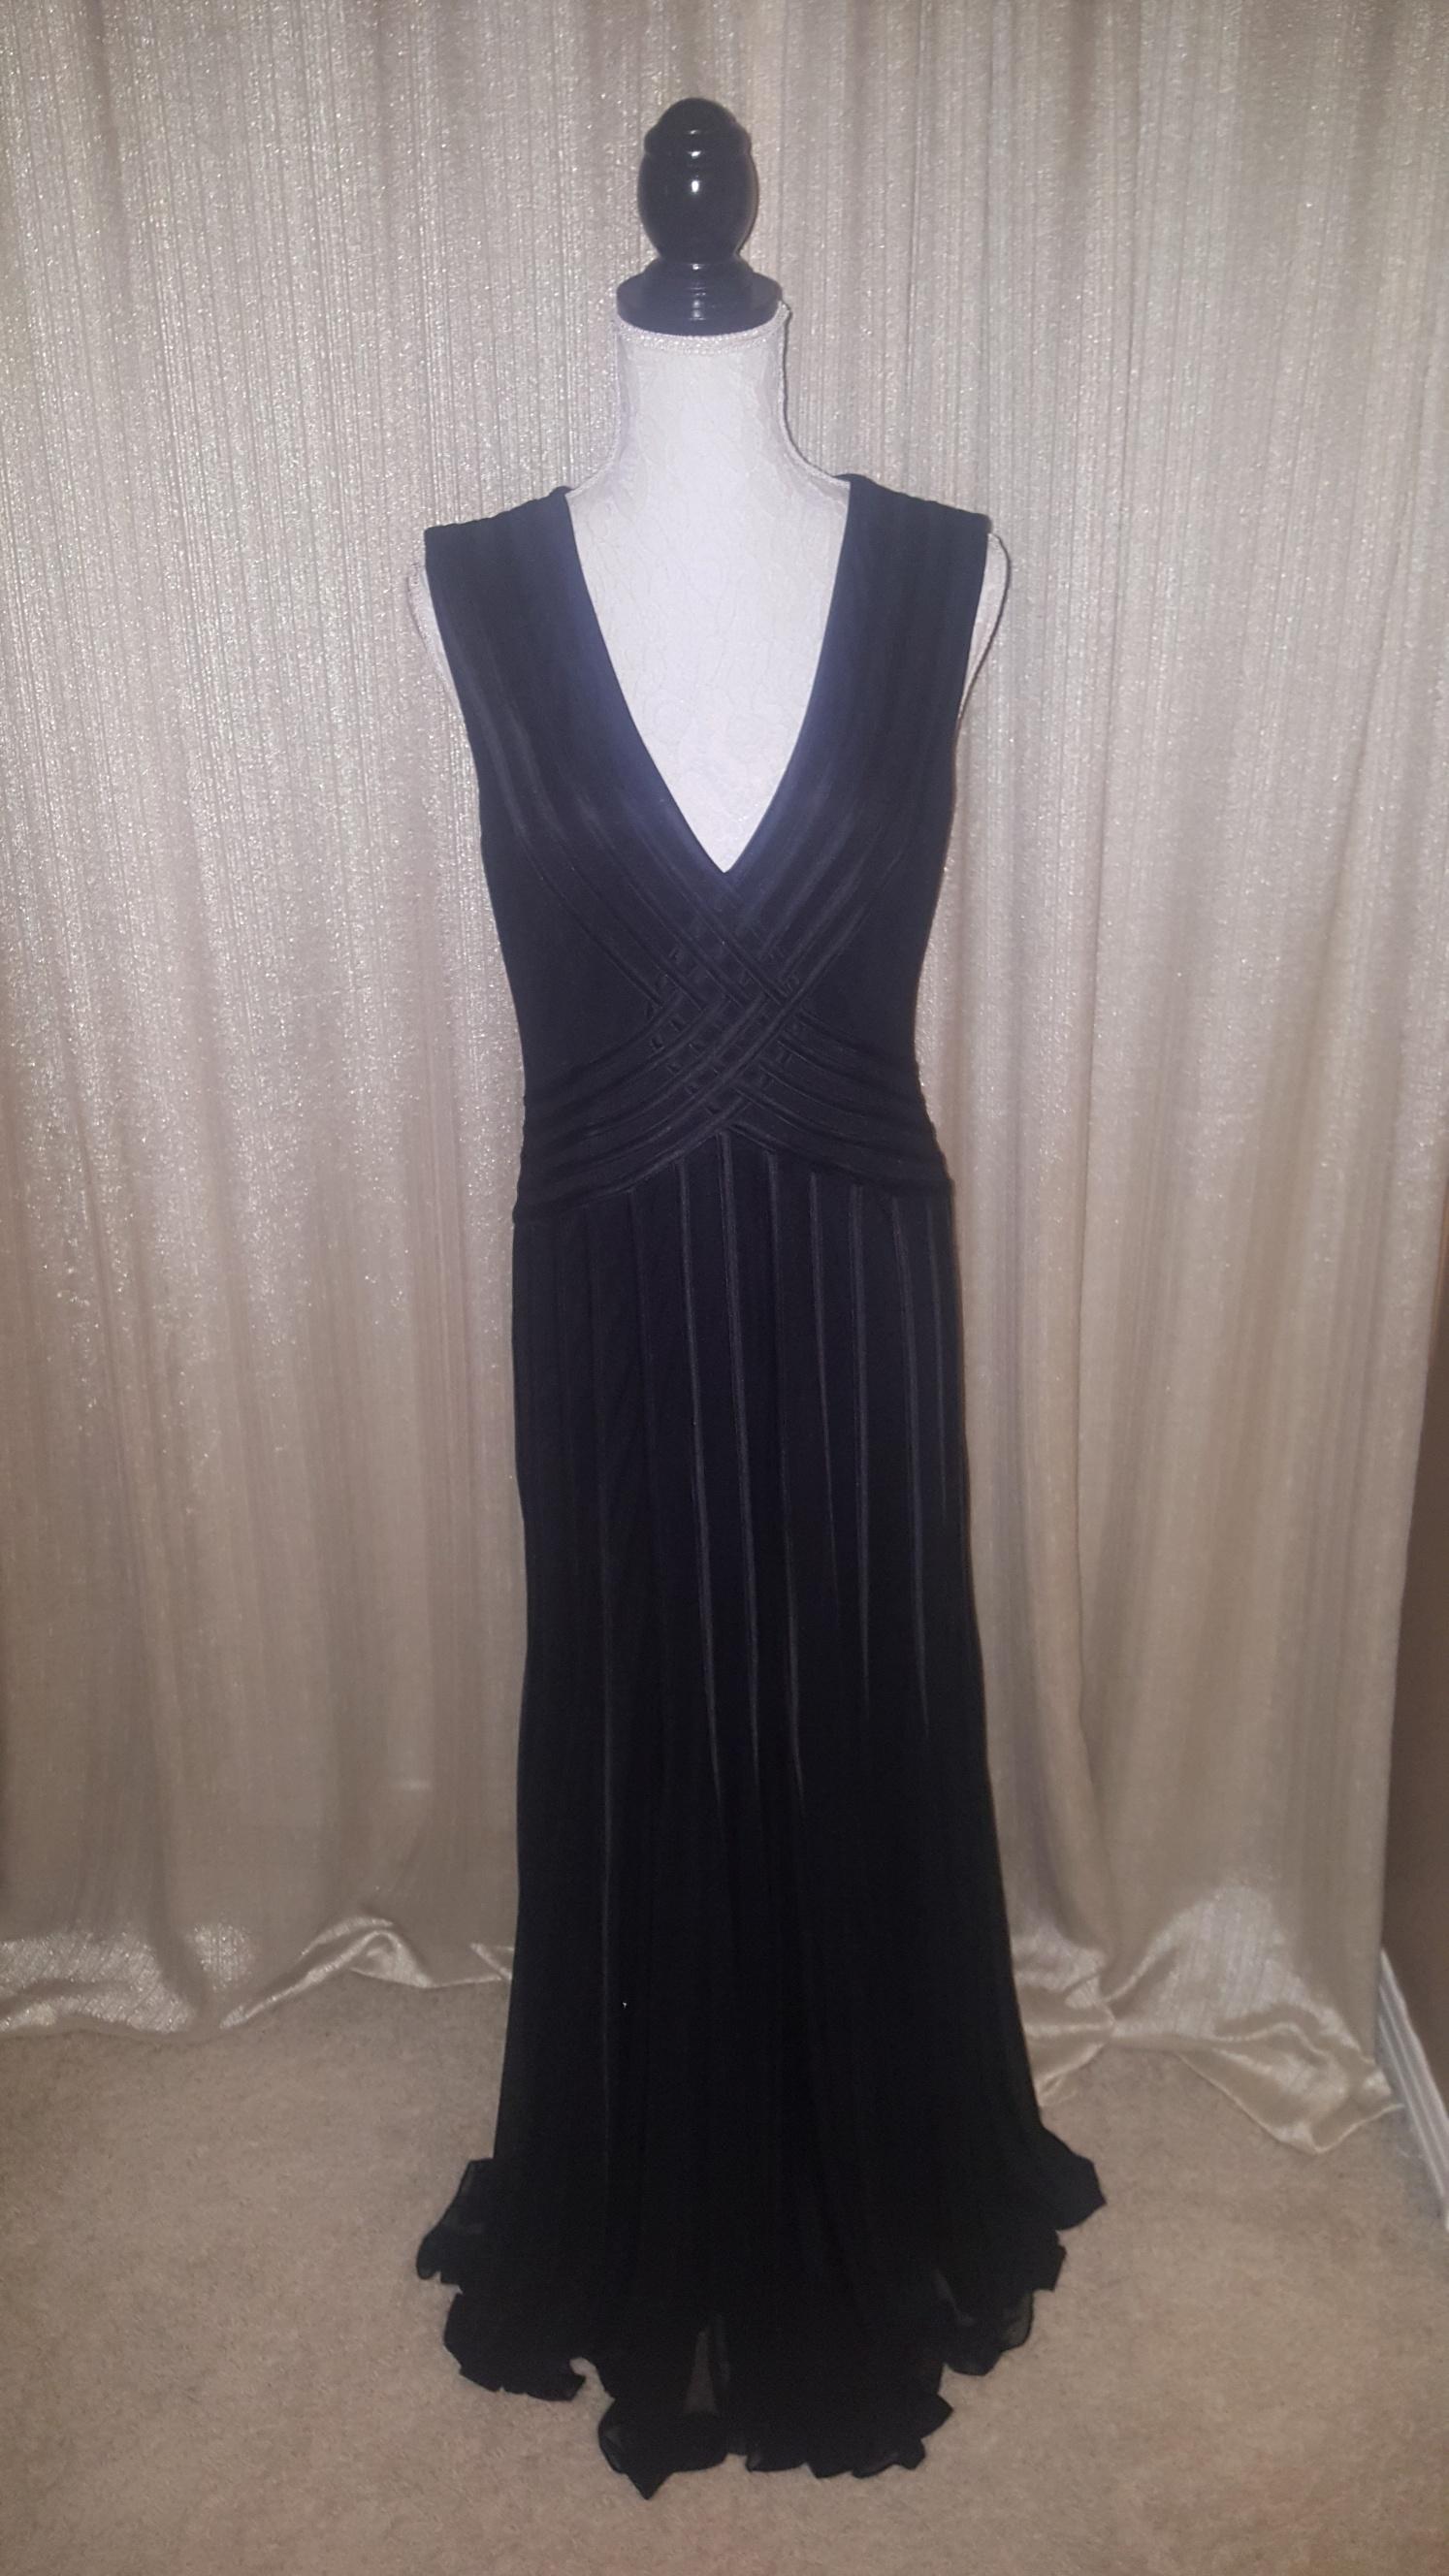 Xscape by Joanne Chen, Evening Gown, size 12, $50 – Desirée ...